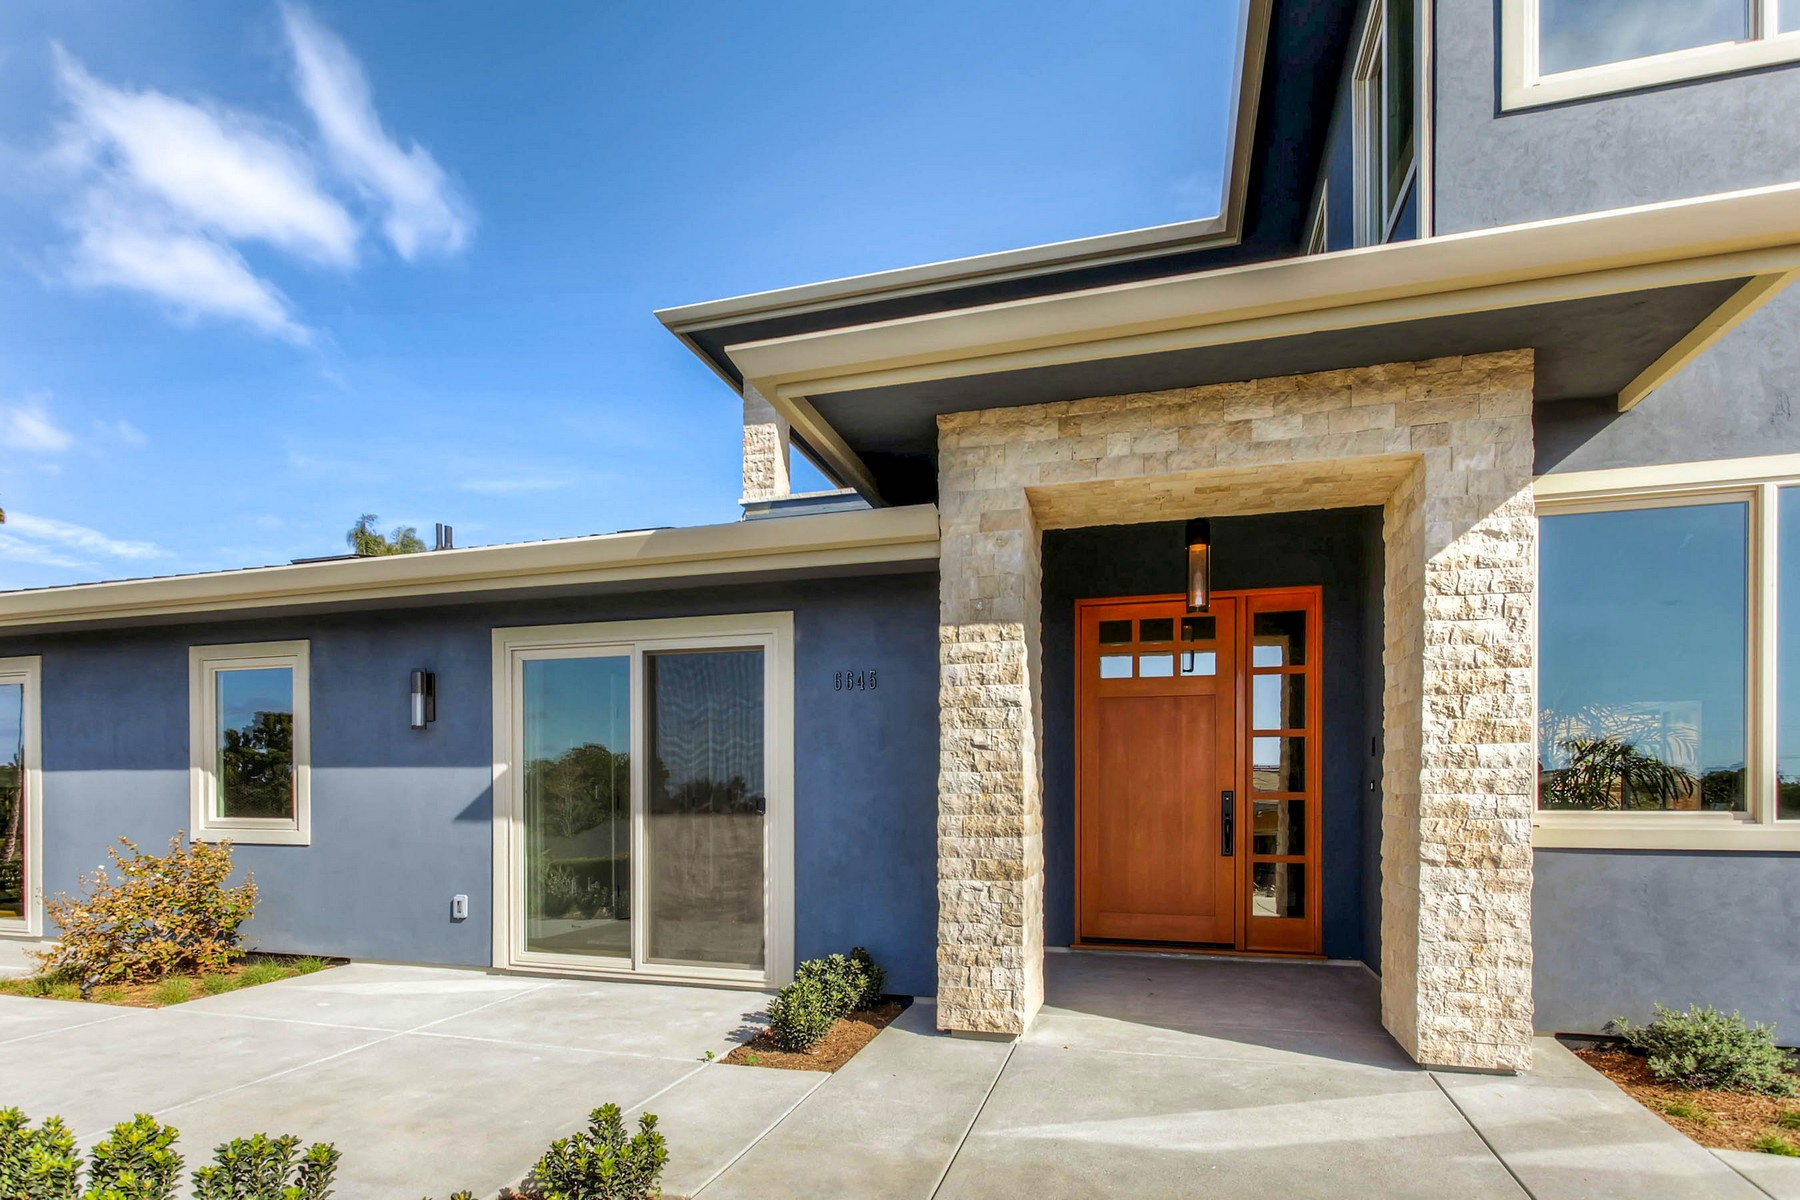 Additional photo for property listing at 6645 Avenida De Las Pescas  La Jolla, Californie 92037 États-Unis